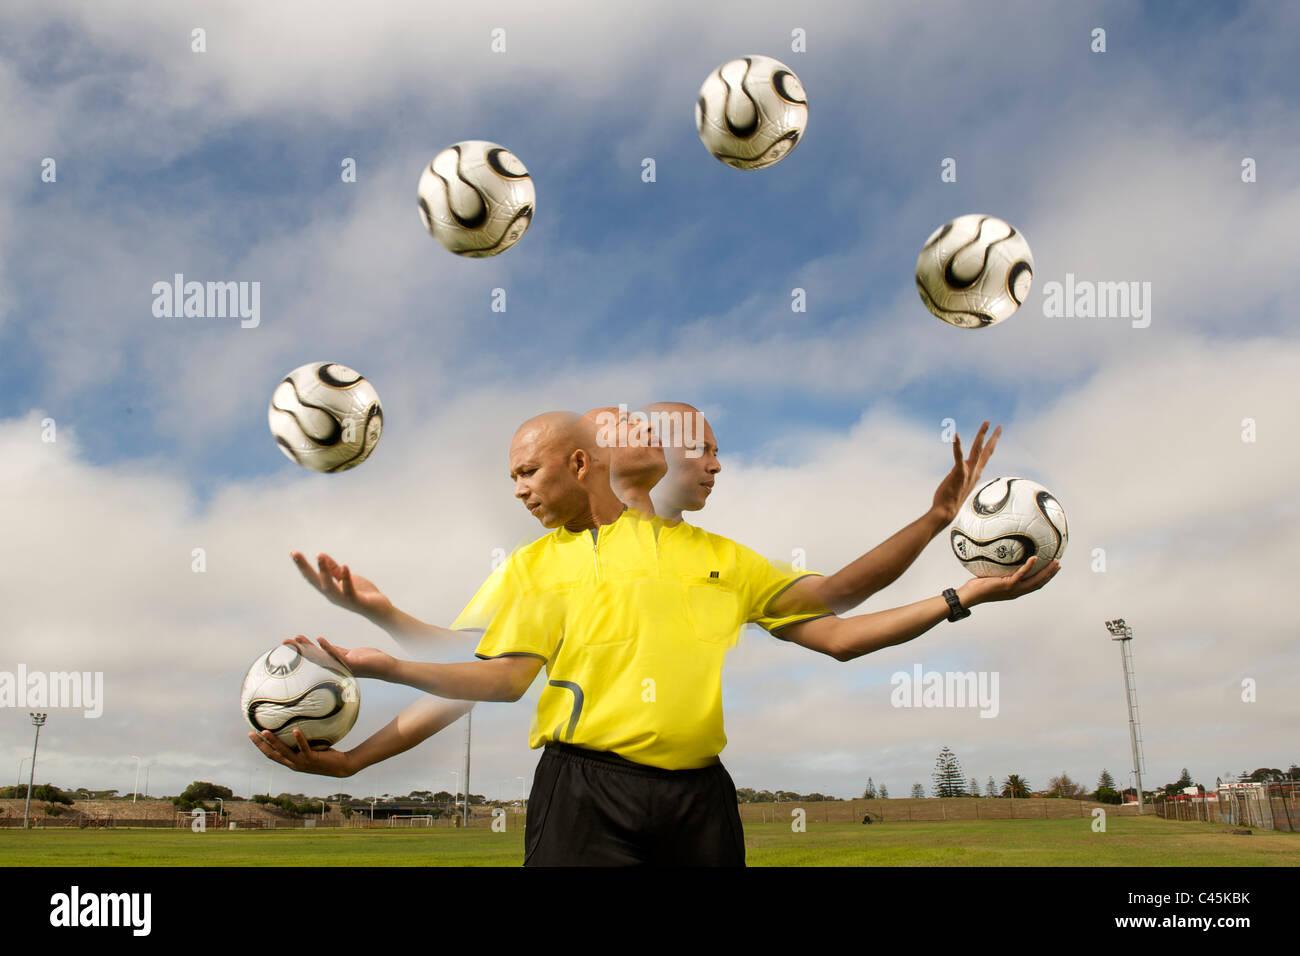 Jerome Damon, FIFA 2010 referee, Cape Town, April 2010. - Stock Image